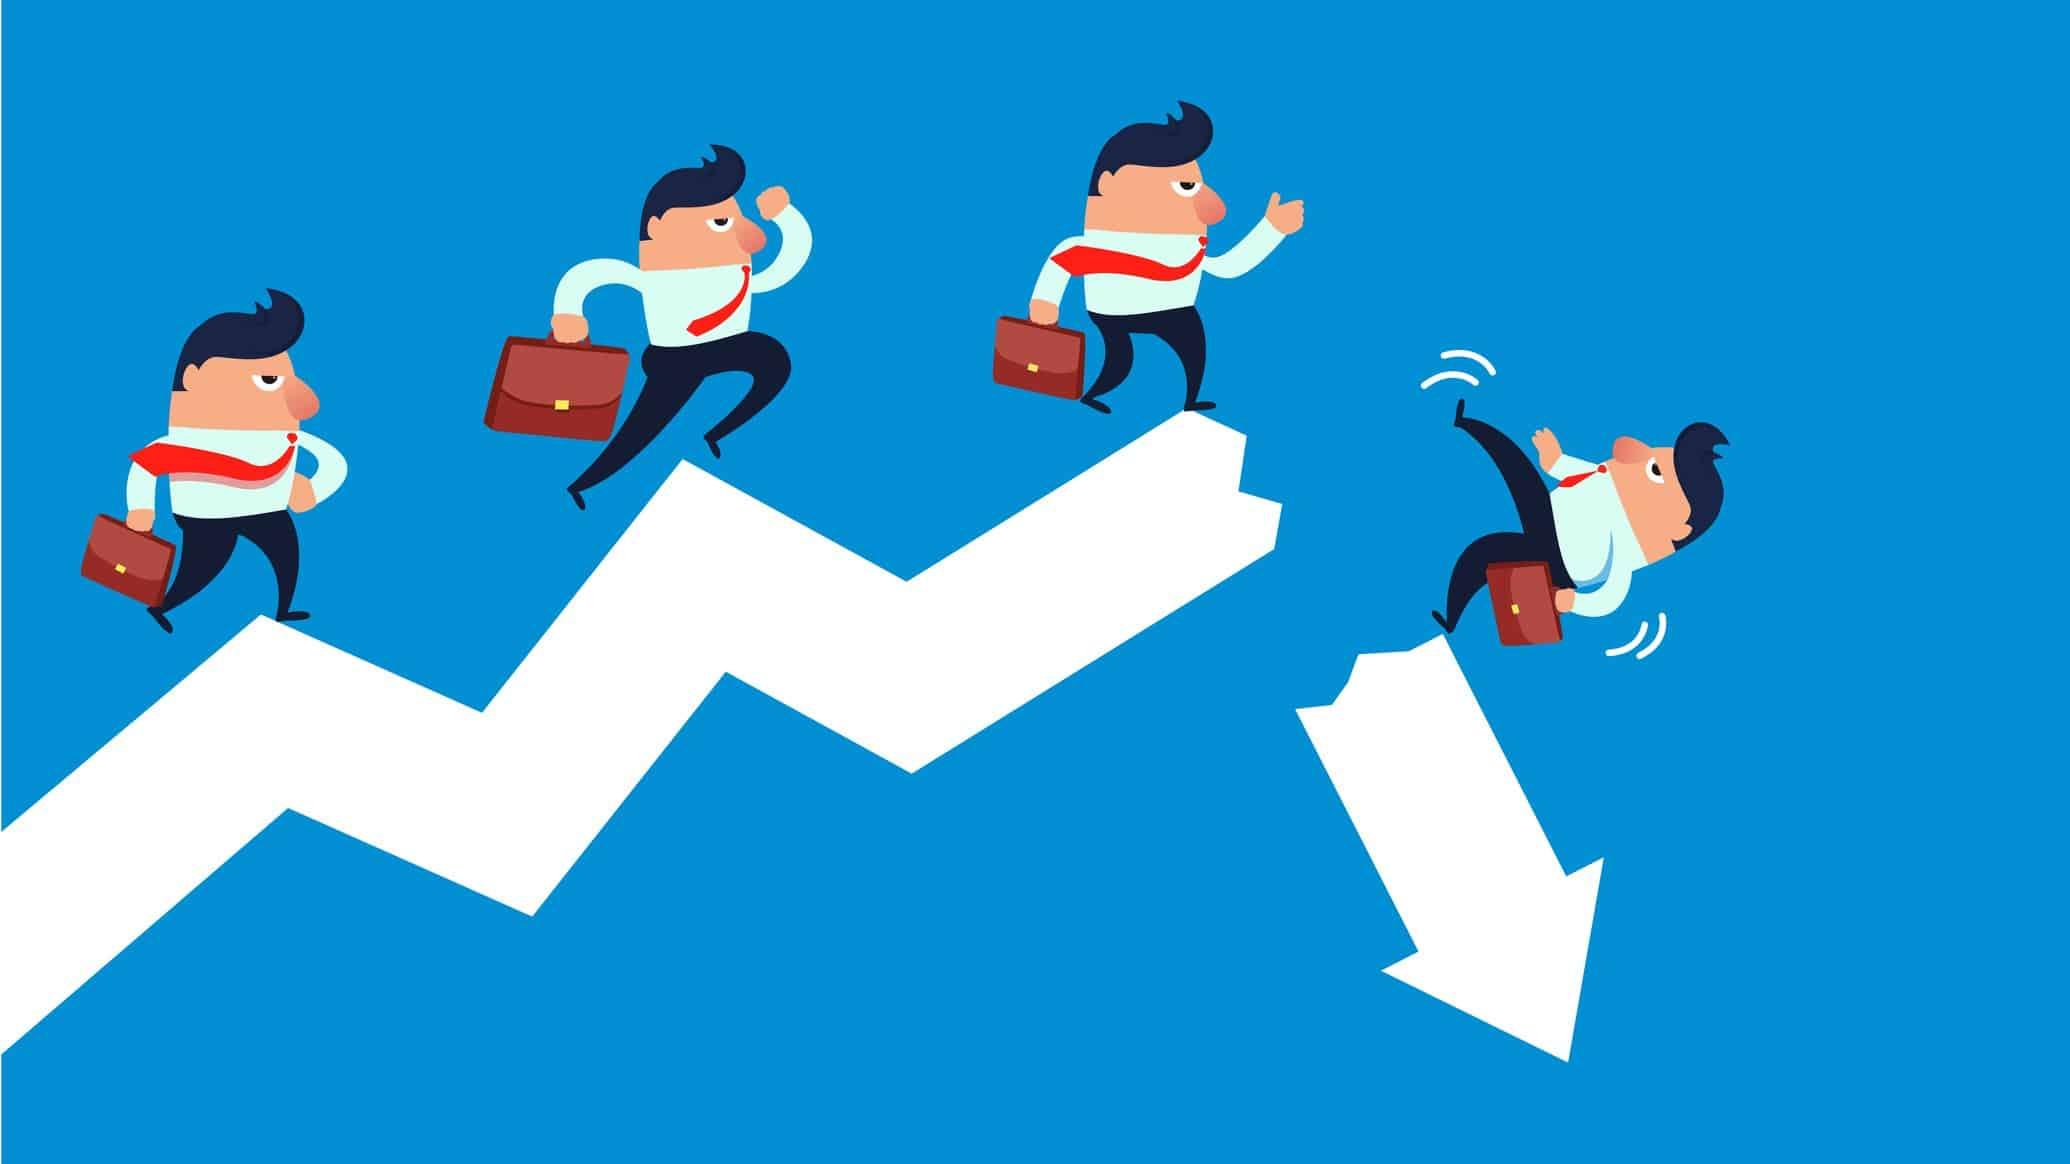 mesoblast share price falling represented by cartoon of little business men falling off broken graph arrow